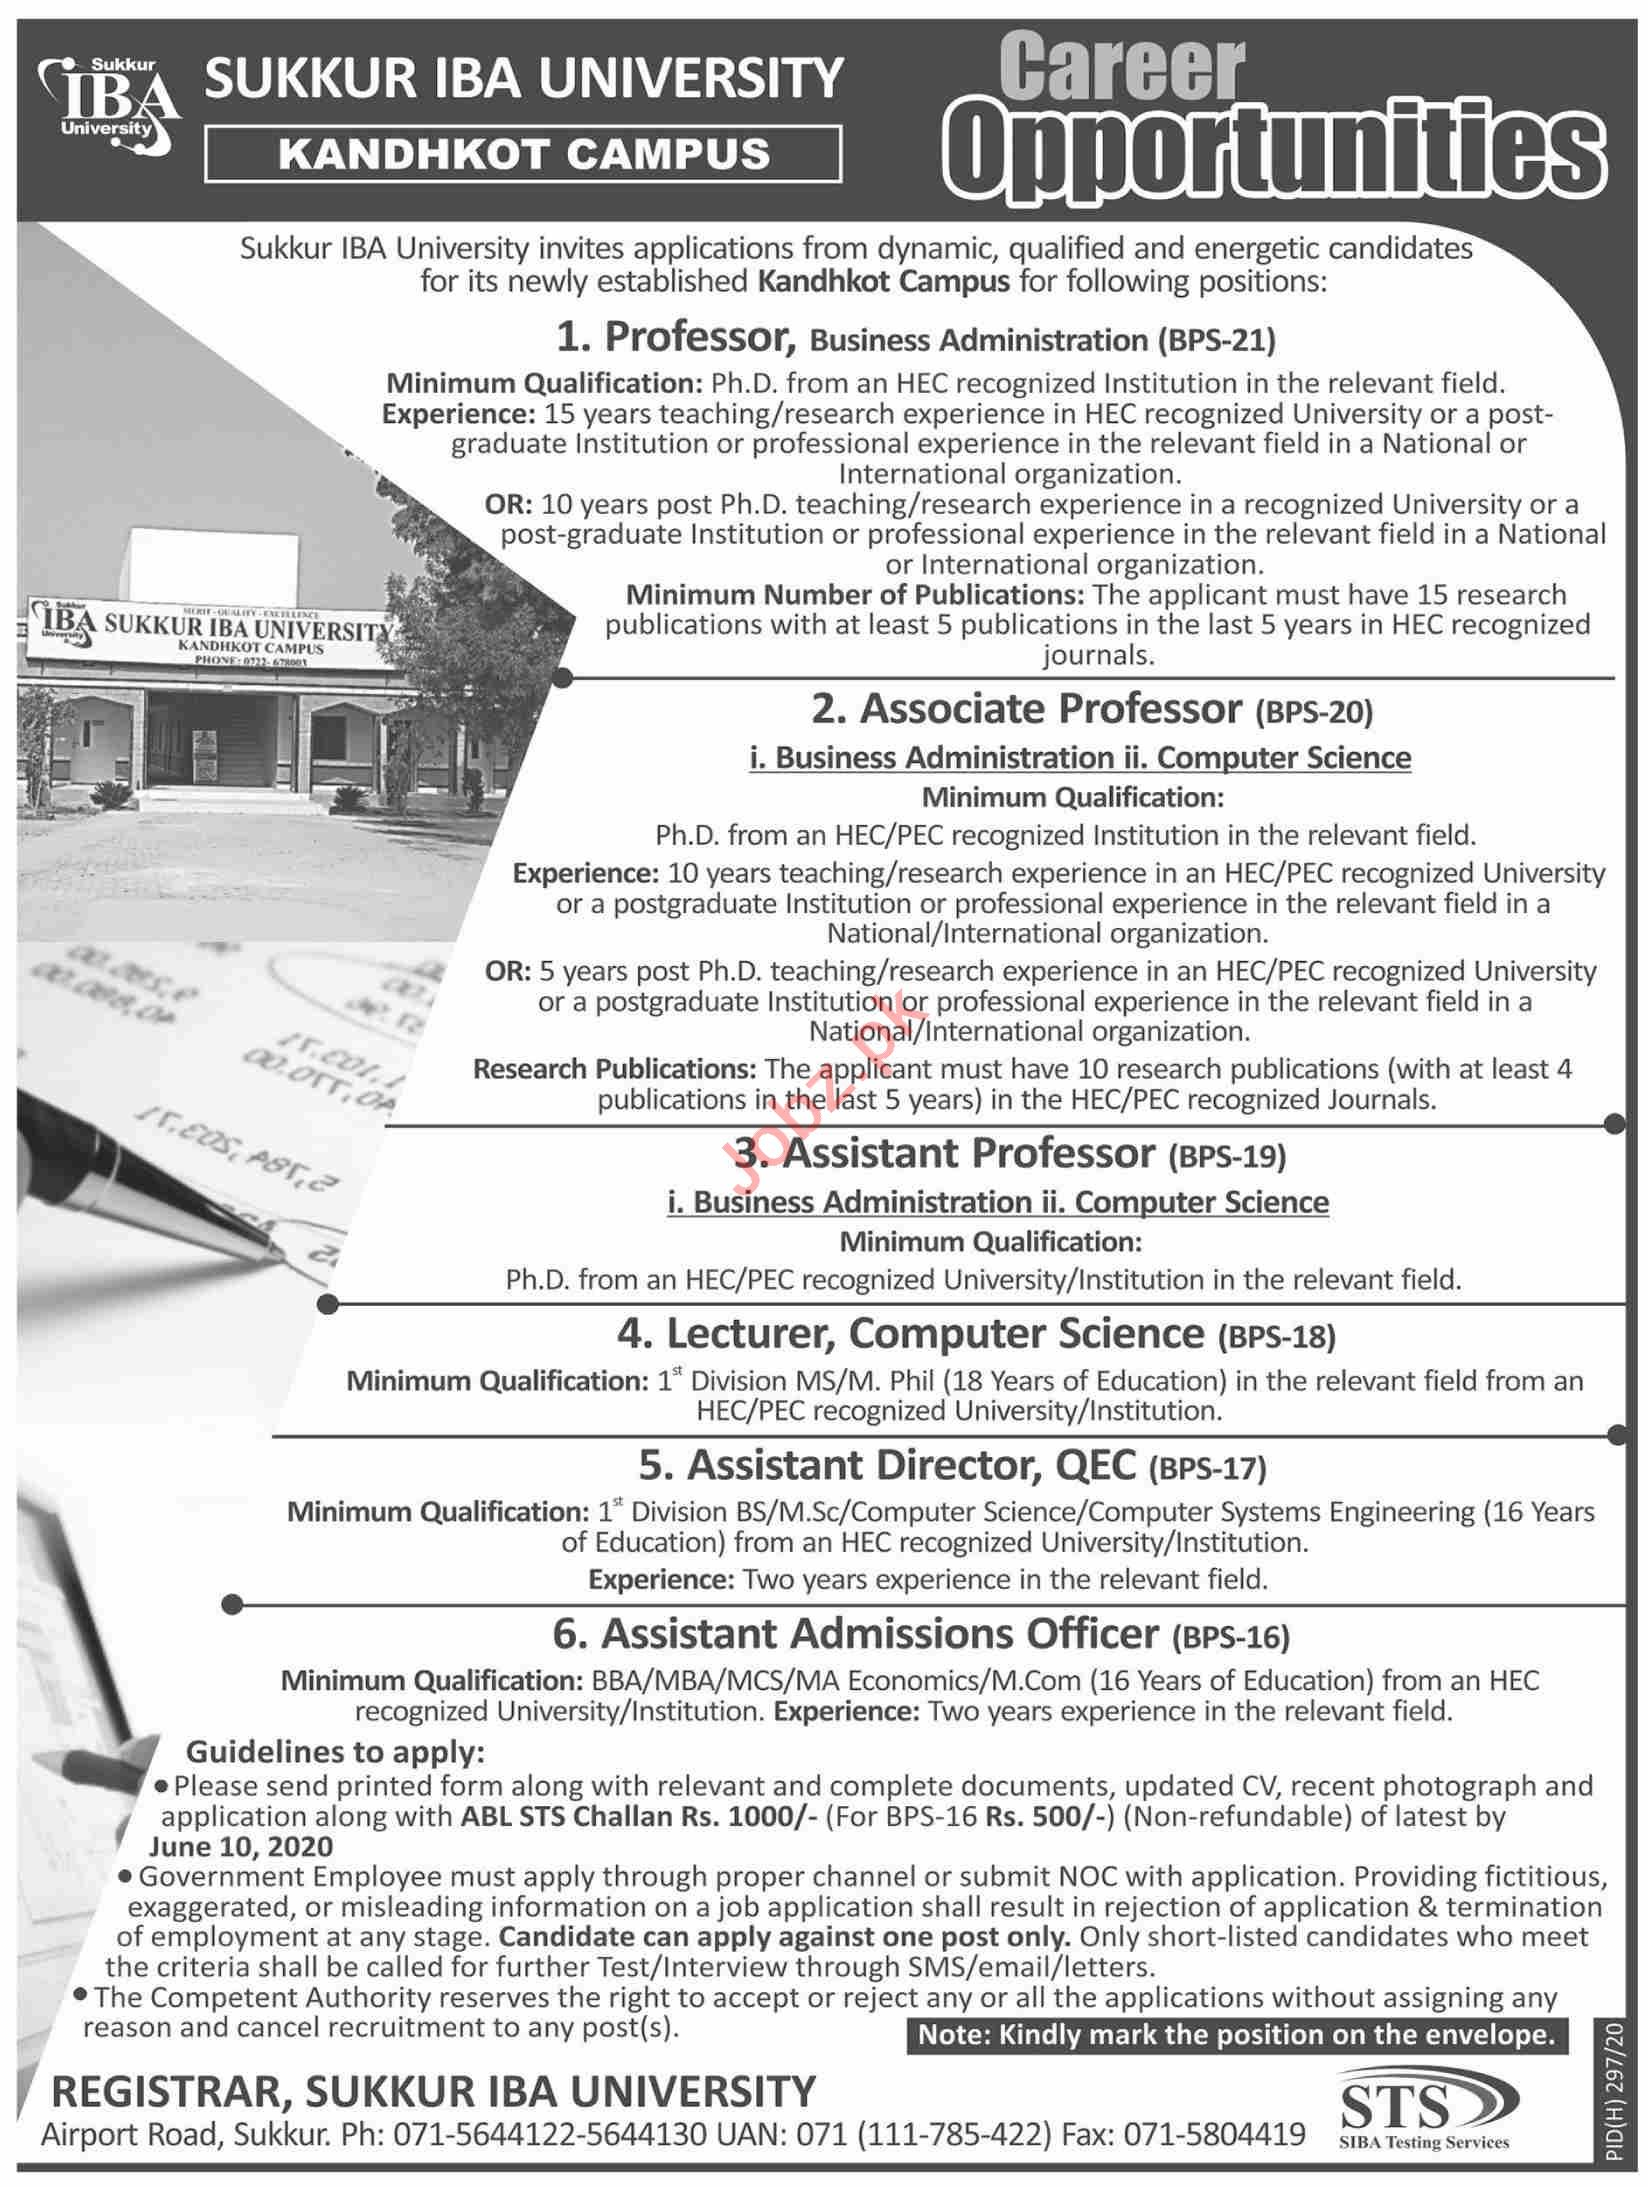 Sukkur IBA University Kandhkot Campus Jobs 2020